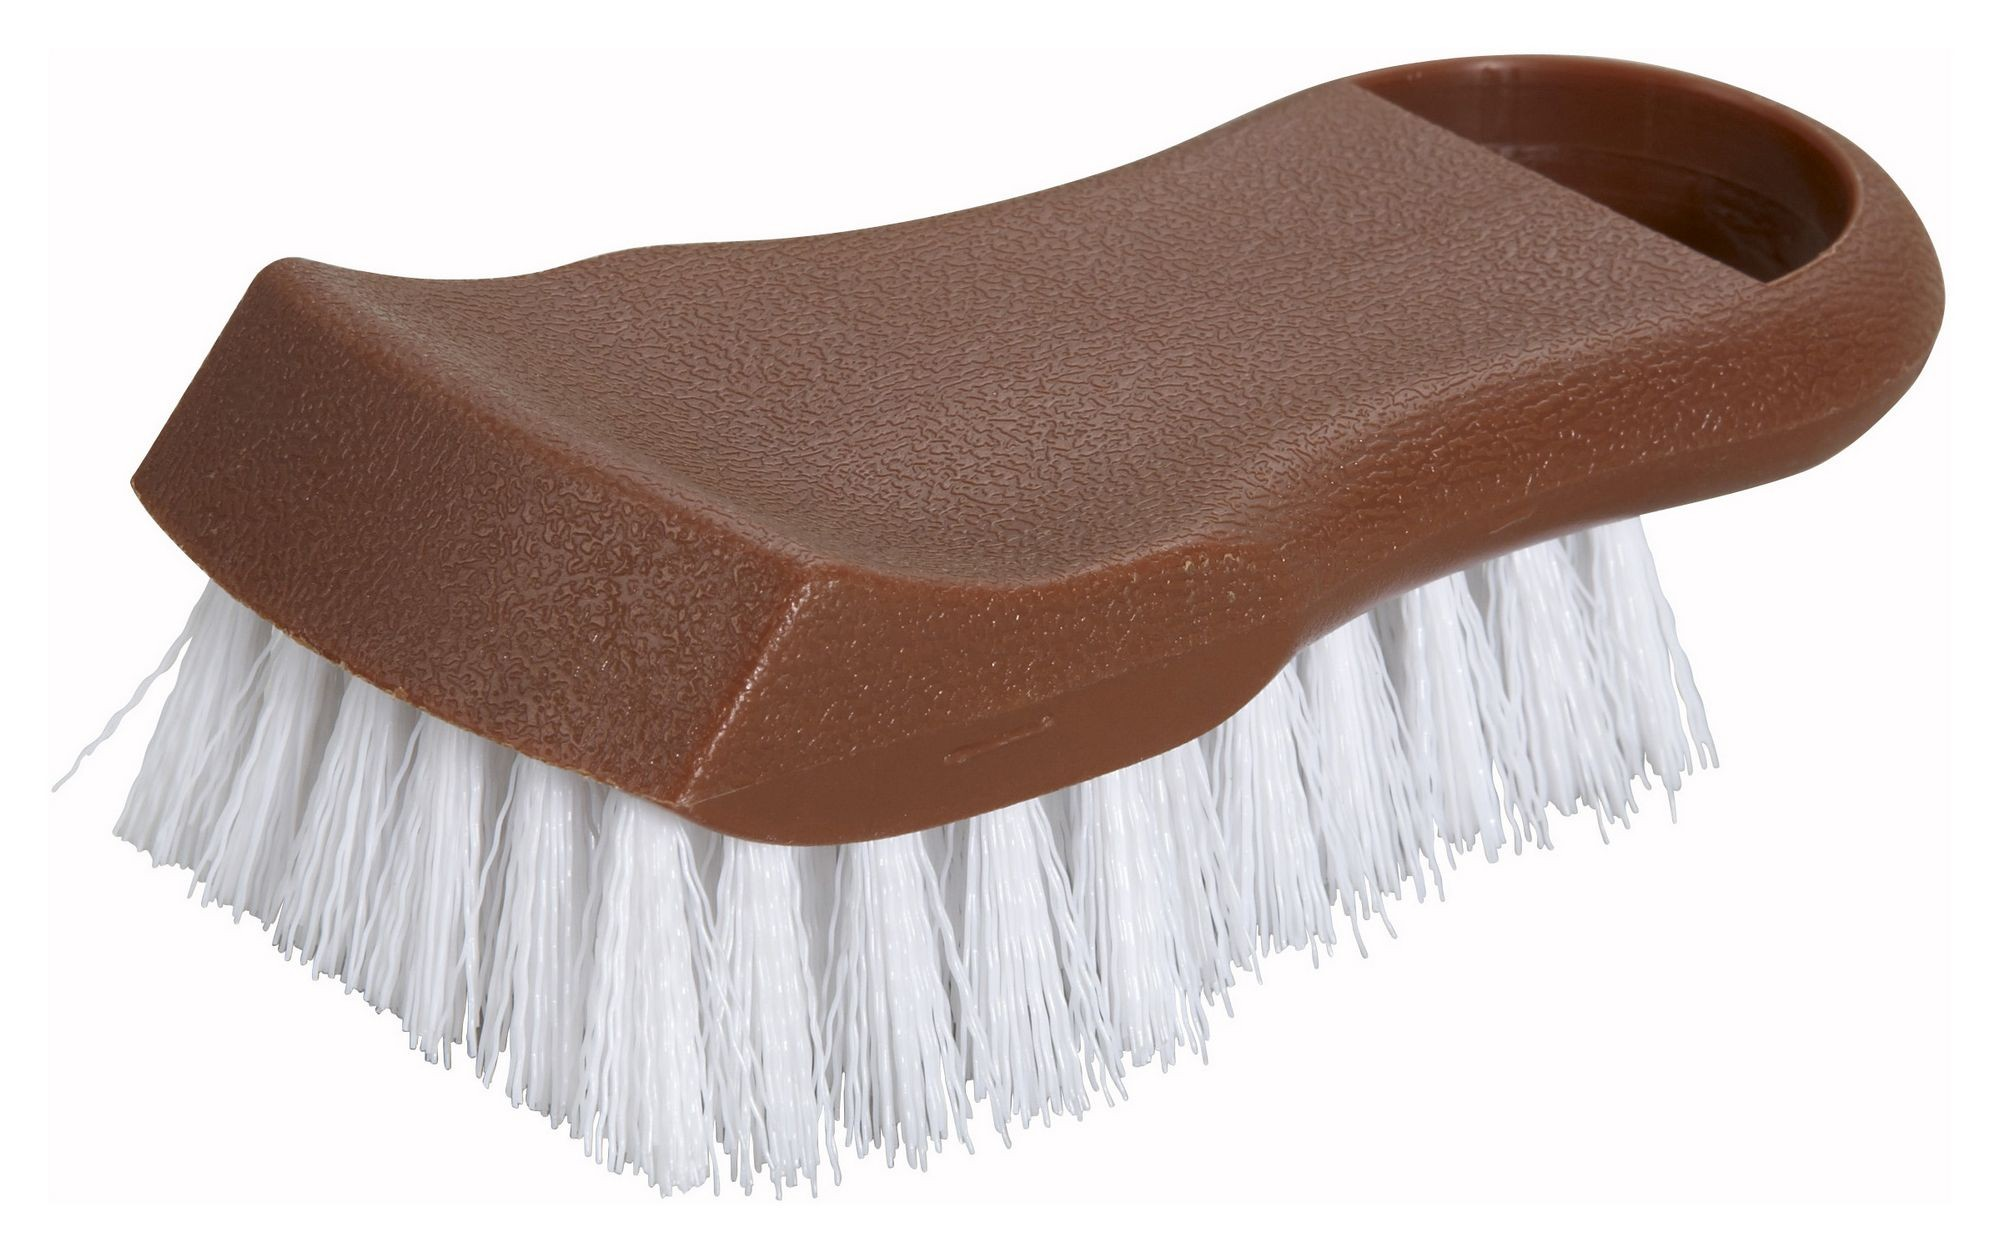 Winco CBR-BN Brown Cutting Board Brush